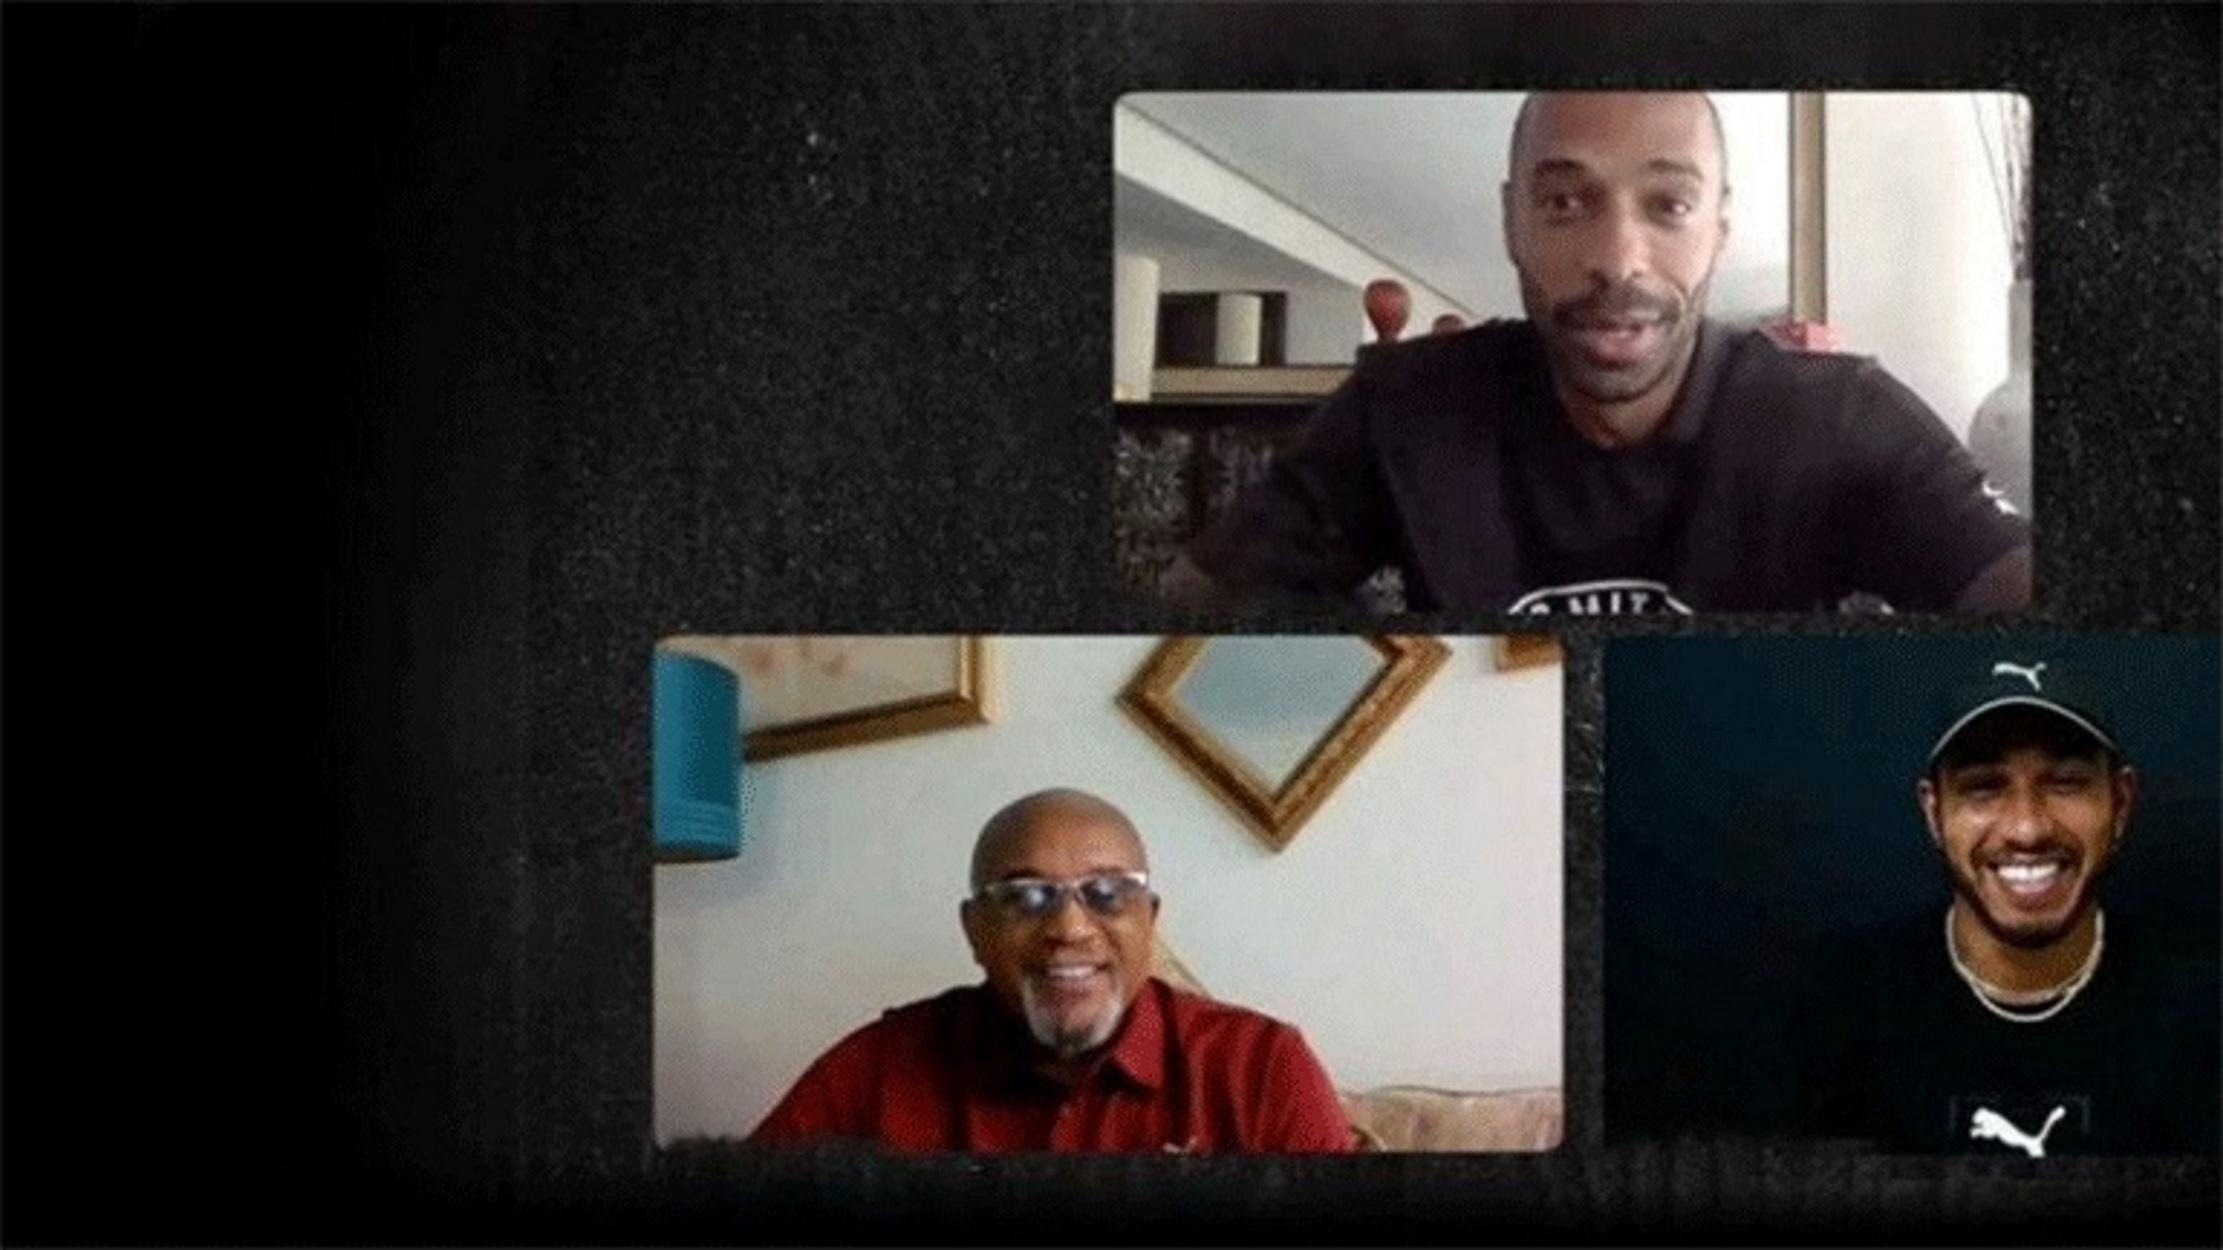 Puma: Λιούις Χάμιλτον, Τιερί Ανρί και Τόμι Σμιθ μιλάνε για τον ρατσισμό (pic, video)